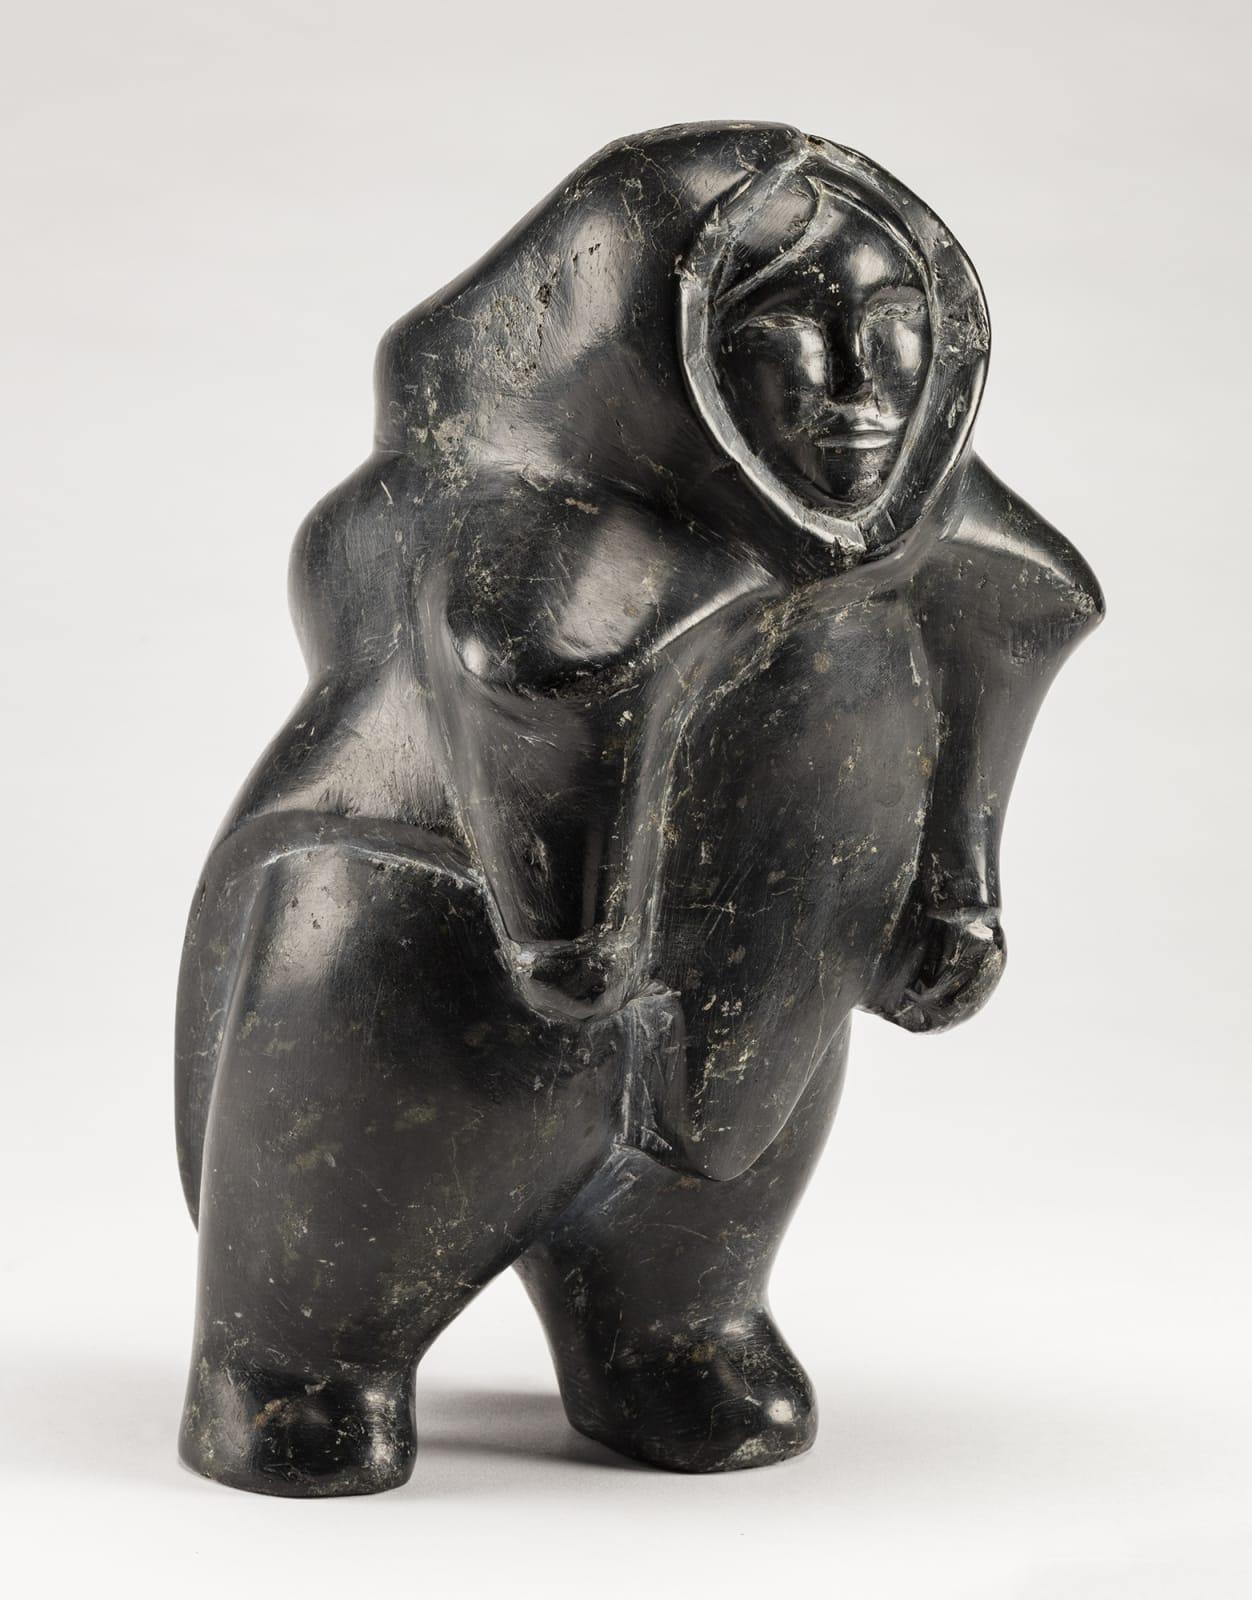 Lot 97 DOMINIC KINGILIK (1939-1990), QAMANI'TUAQ (BAKER LAKE) Walking Woman, 1964 stone, 10.5 x 6 x 6 in (26.7 x 15.2 x 15.2 cm) ESTIMATE: $3,500— $5,000 PRICE REALIZED: $3,360